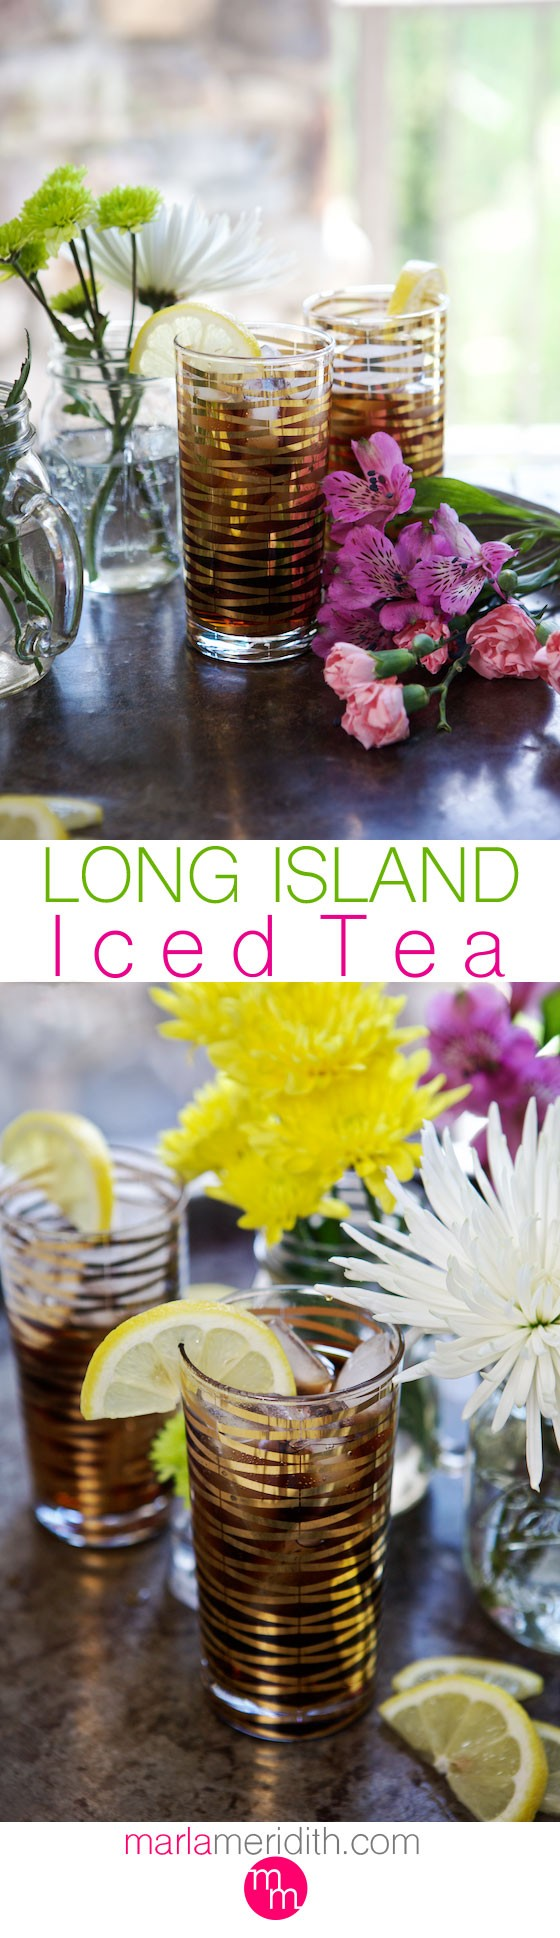 Long Island Iced Tea | Not your regular iced tea! MarlaMeridith.com ( @marlameridith )